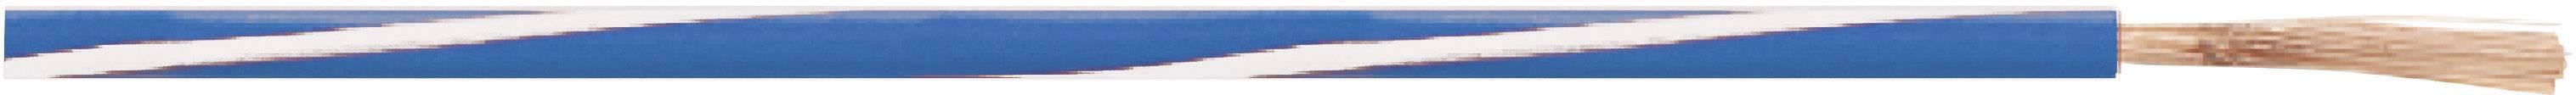 Opletenie / lanko LappKabel 4512231S X05V-K, 1 x 0.50 mm², vonkajší Ø 2.10 mm, metrový tovar, modrá, čierna